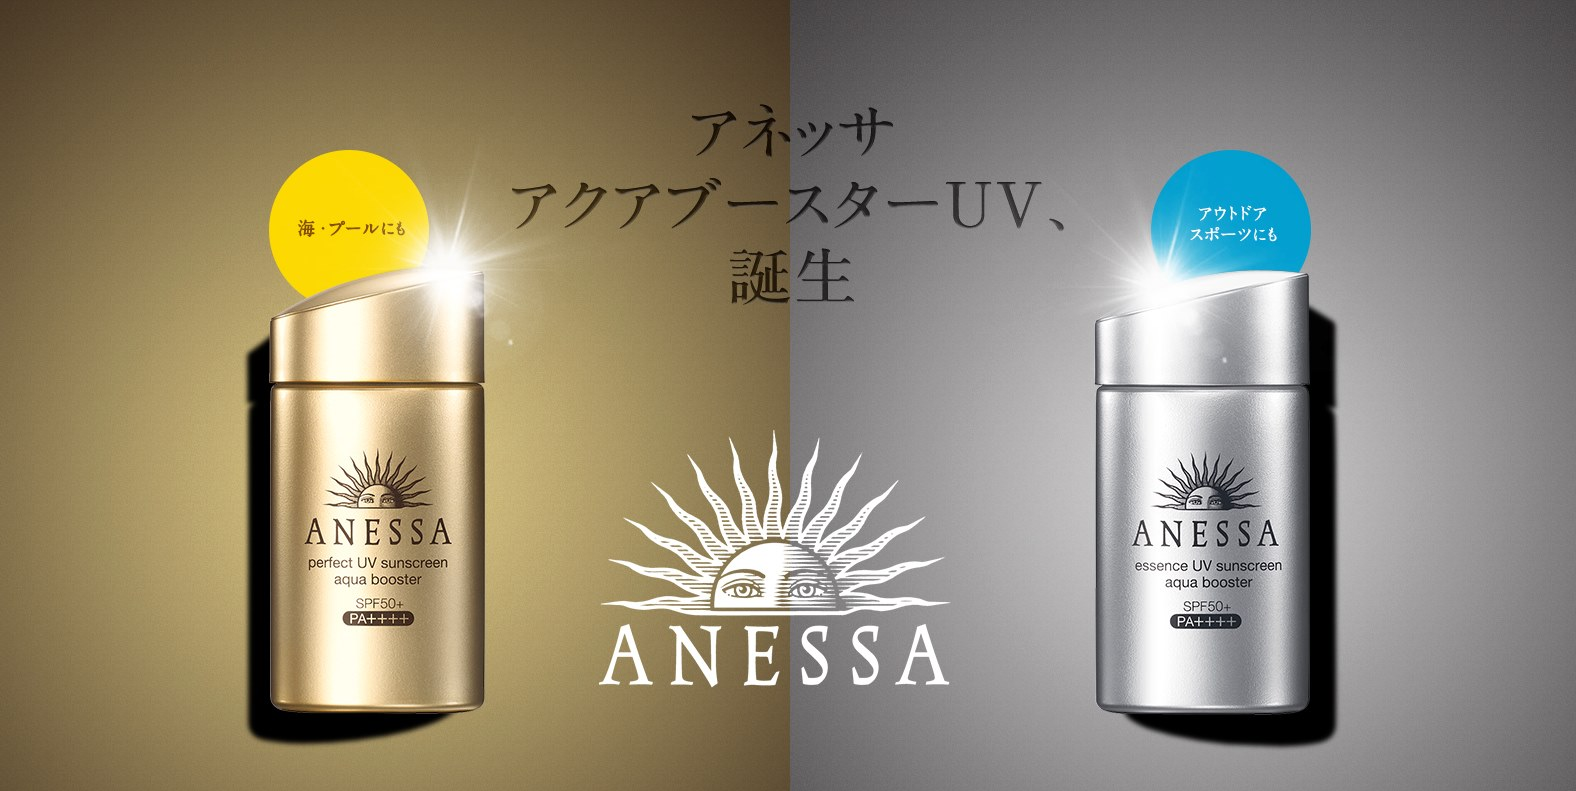 shiseido-anessa-2016